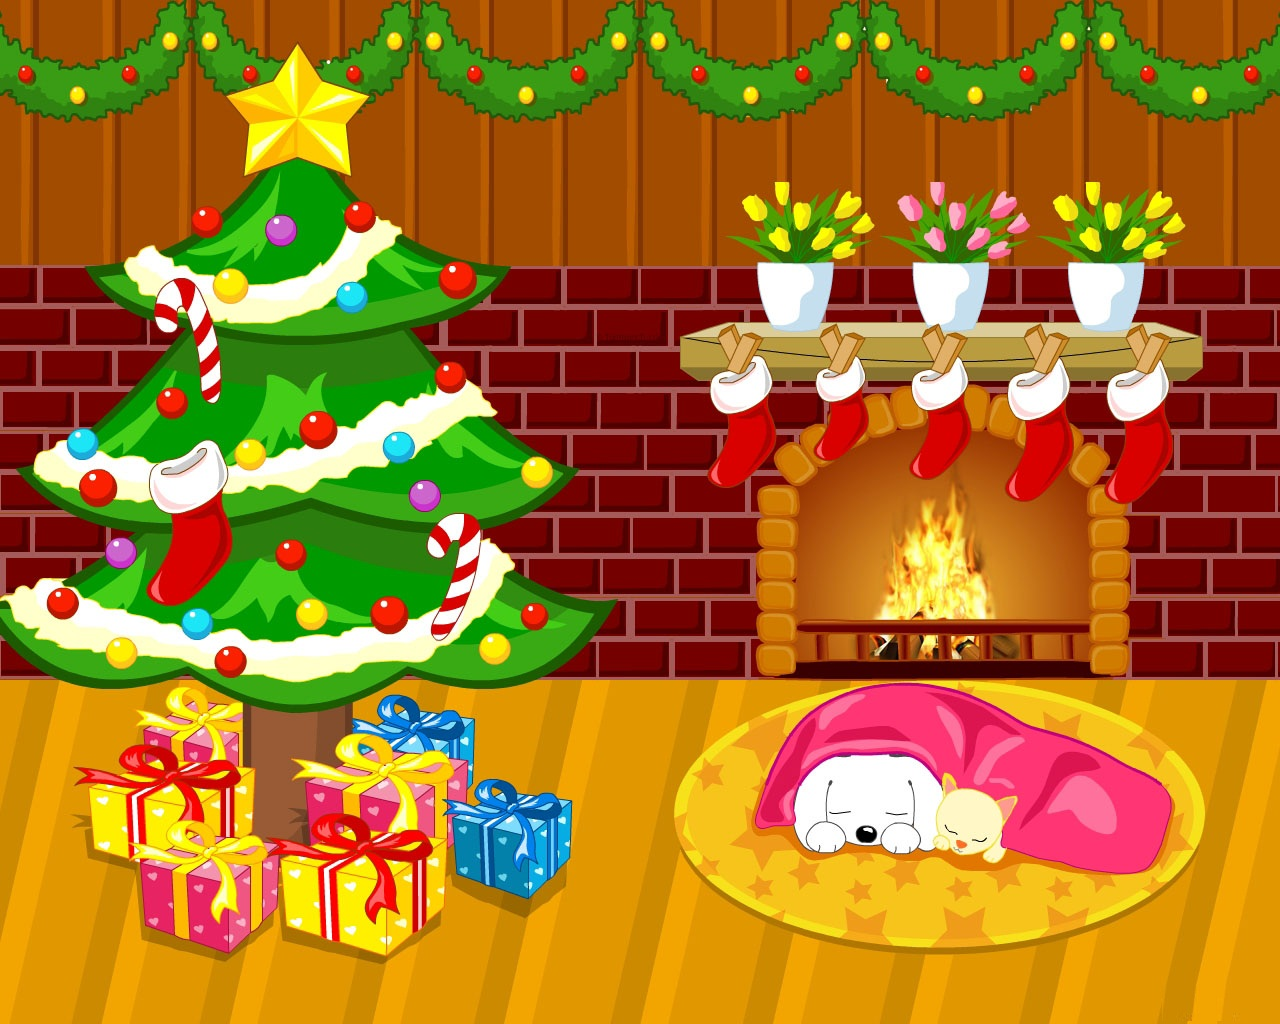 Cute Cartoon Christmas Desktop Wallpapers Free Wallpaper Download 1280x1024